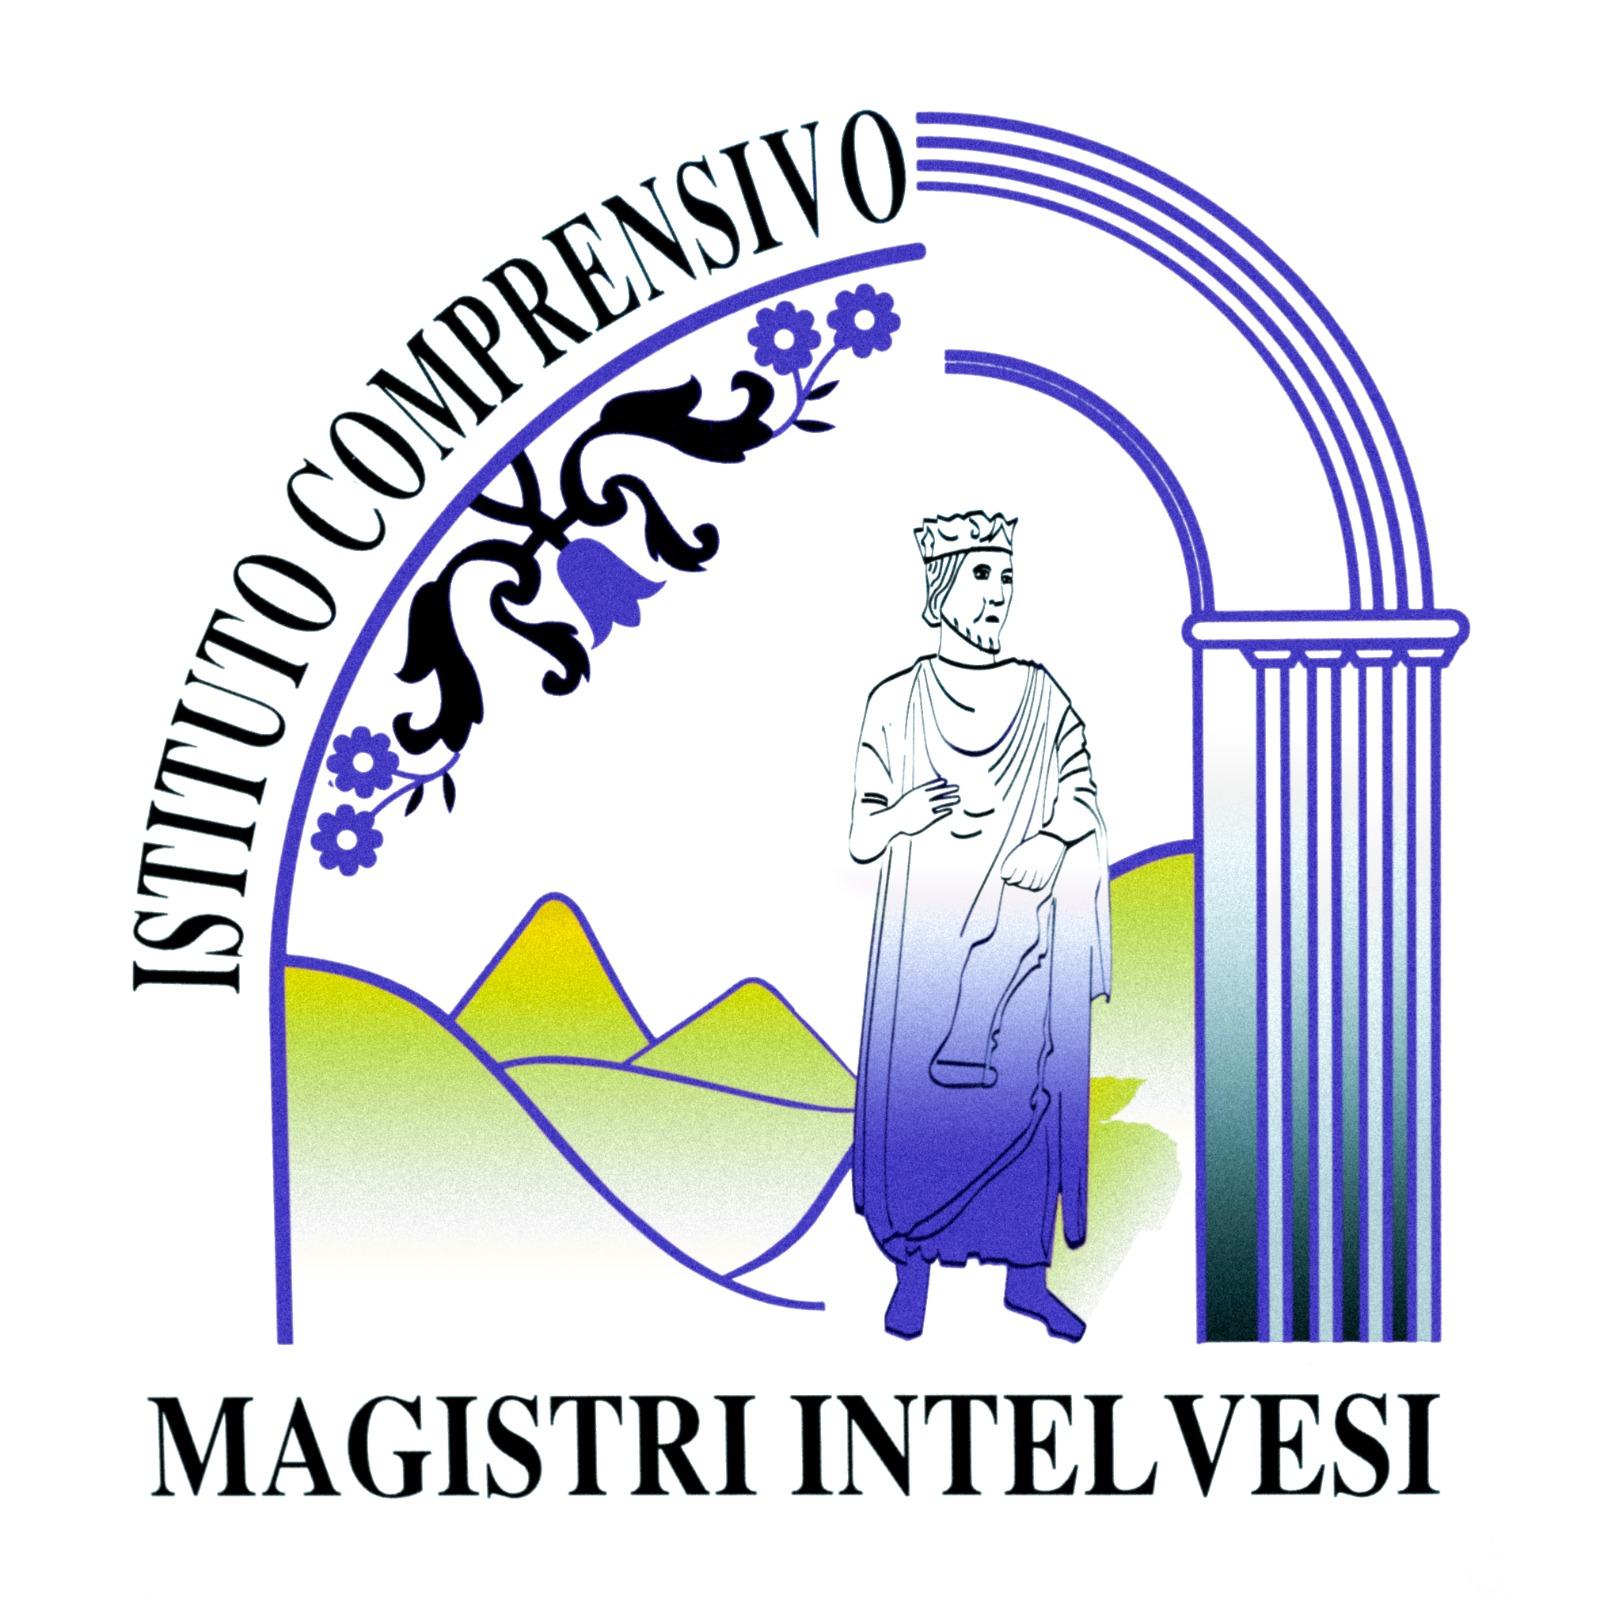 IC Magistri Intelvesi